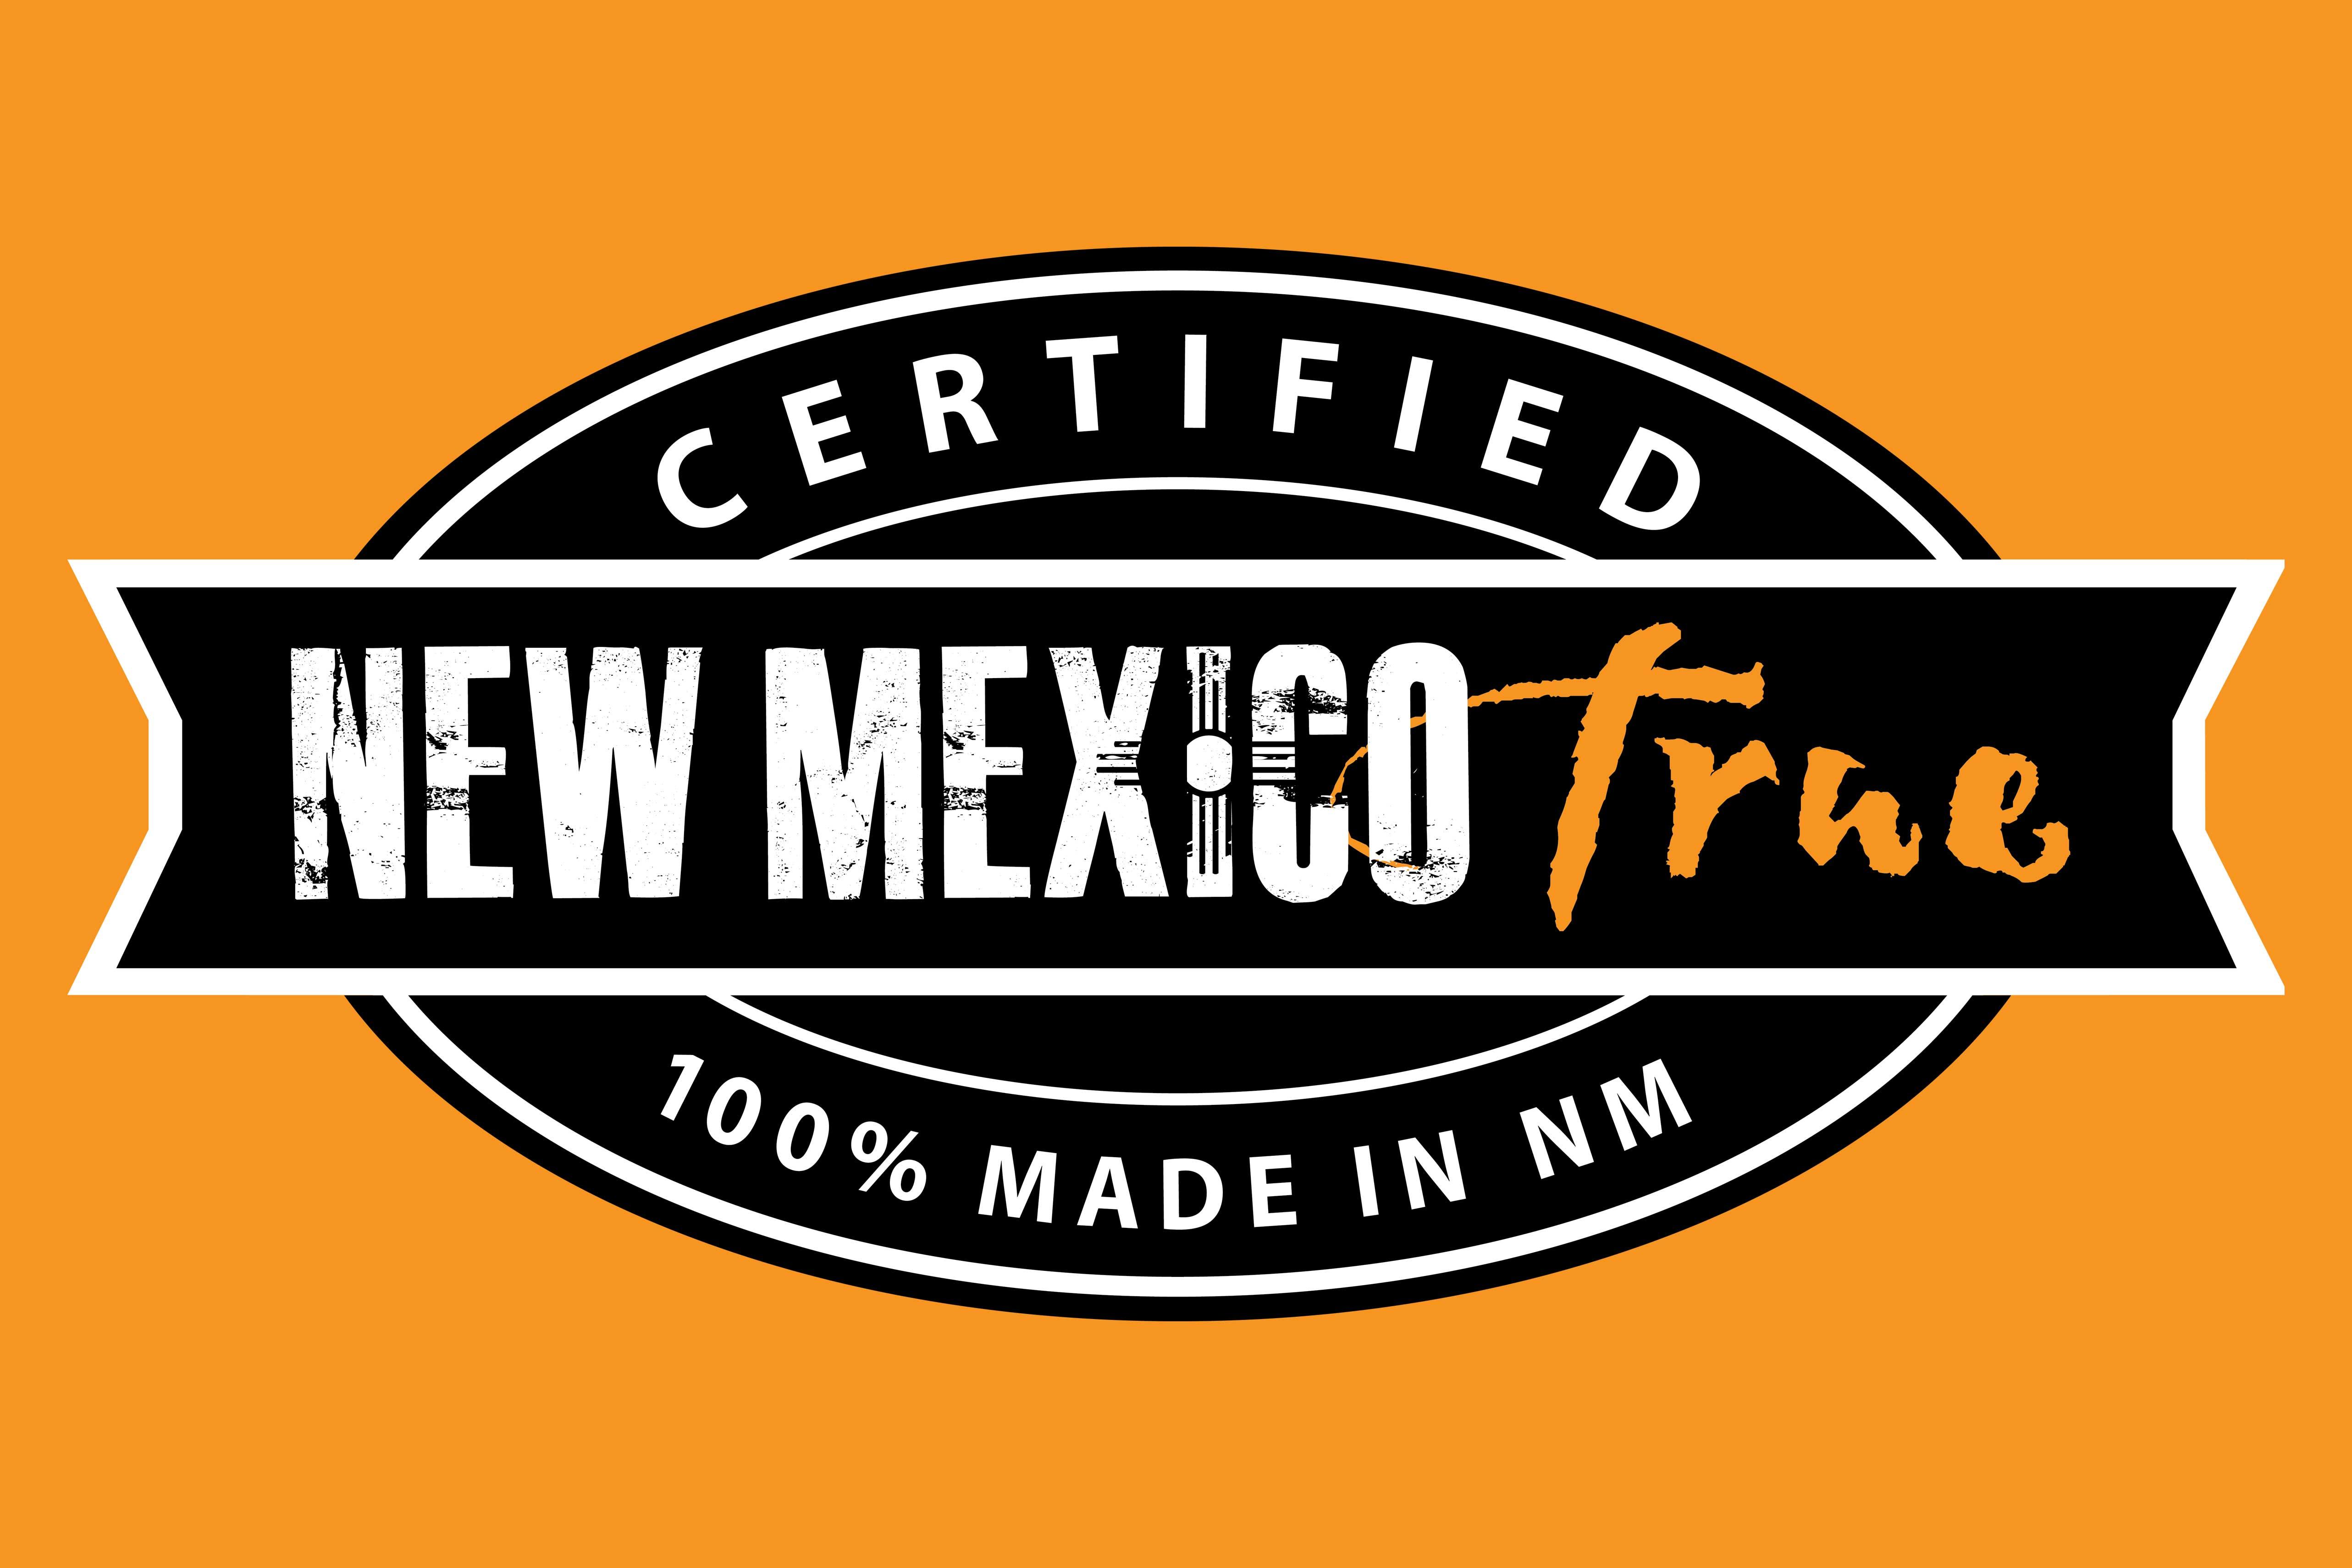 New Mexico True Resources